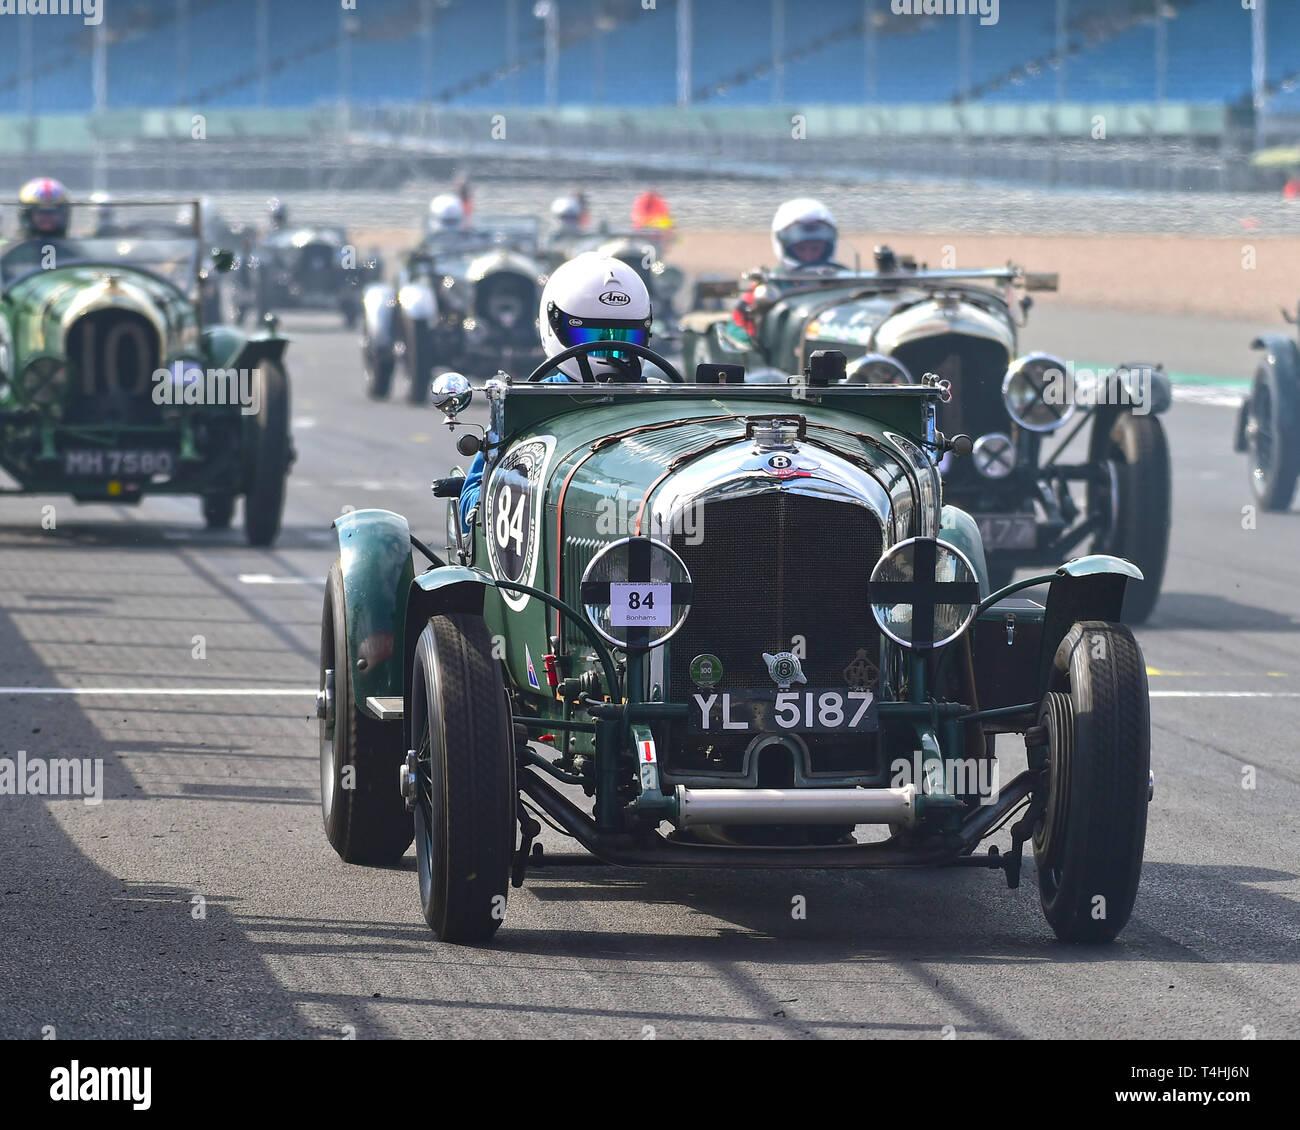 Neil Sandwith, Bentley 3-4½ litre, Benjafield 100, 100 Years of Bentley, April 2019,  Silverstone, Northamptonshire, England, circuit racing, classic  - Stock Image